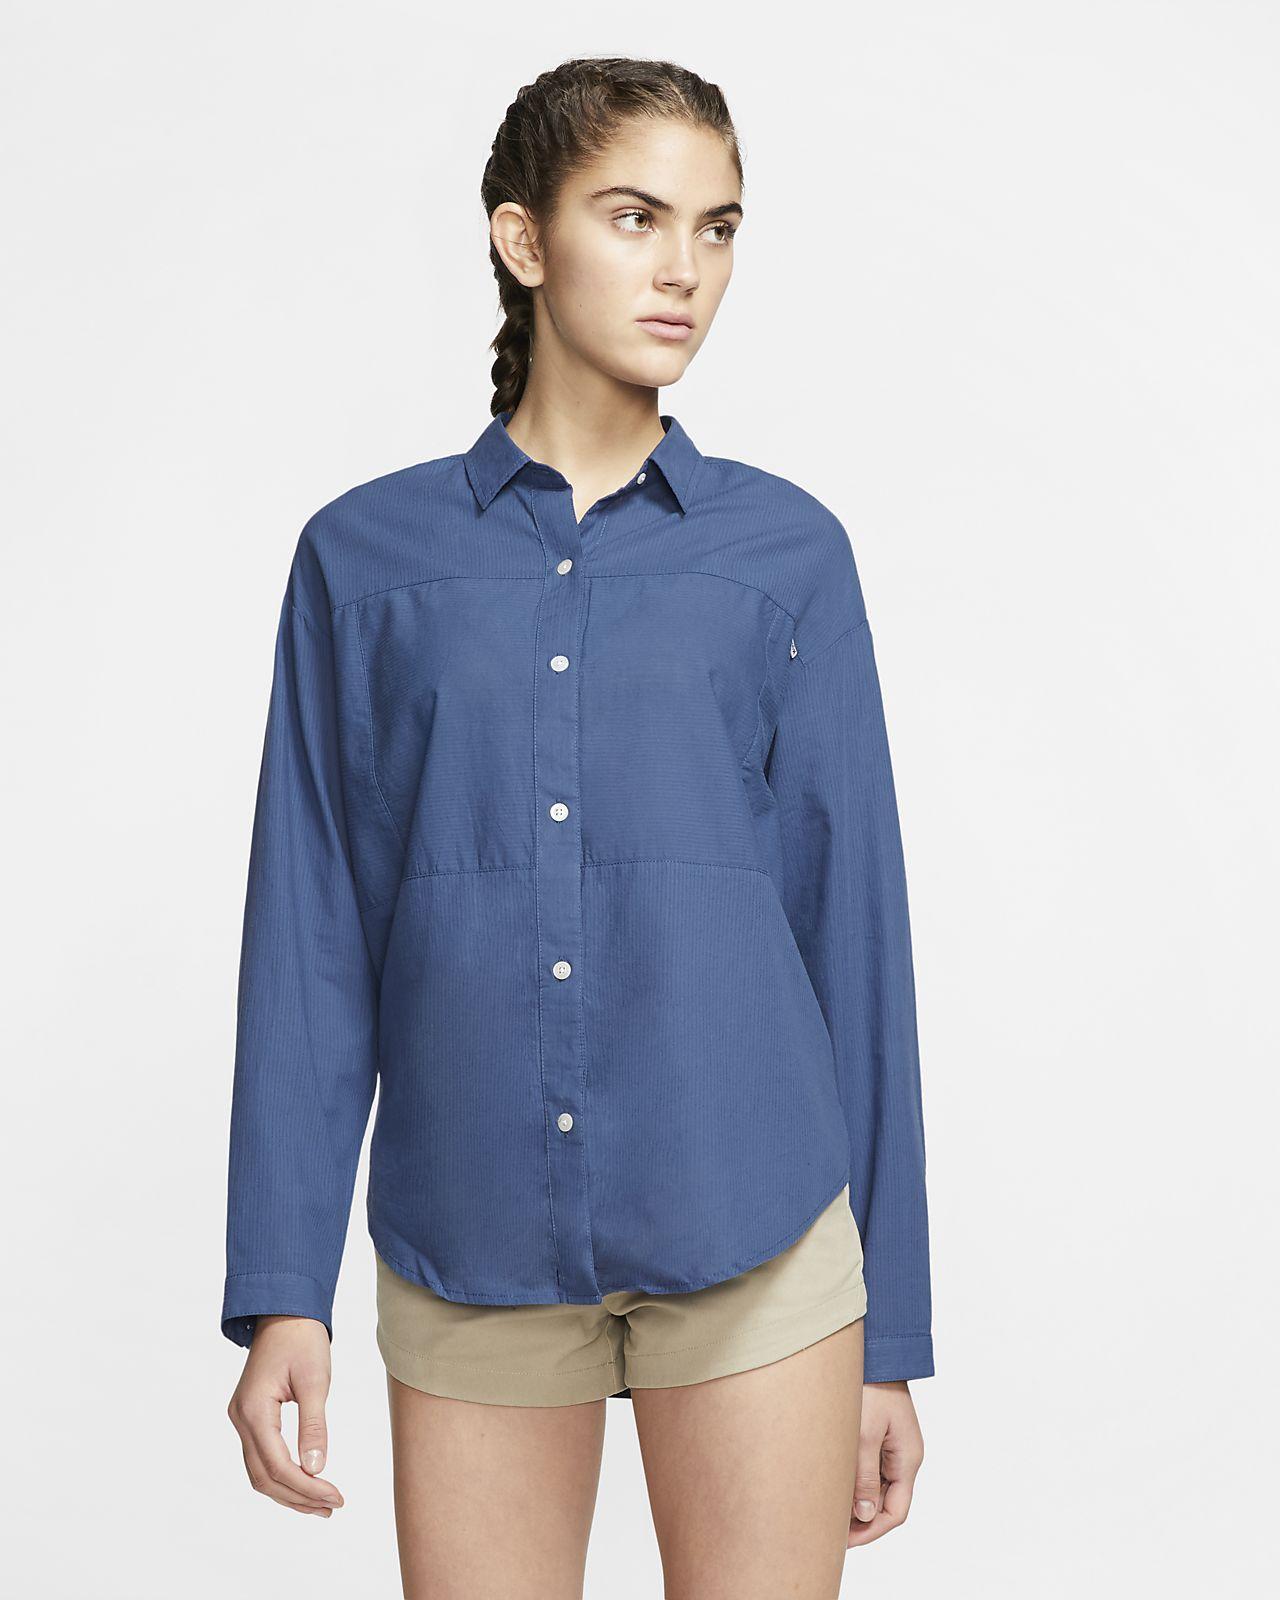 Hurley Wilson Shadow Dolman Camiseta - Mujer